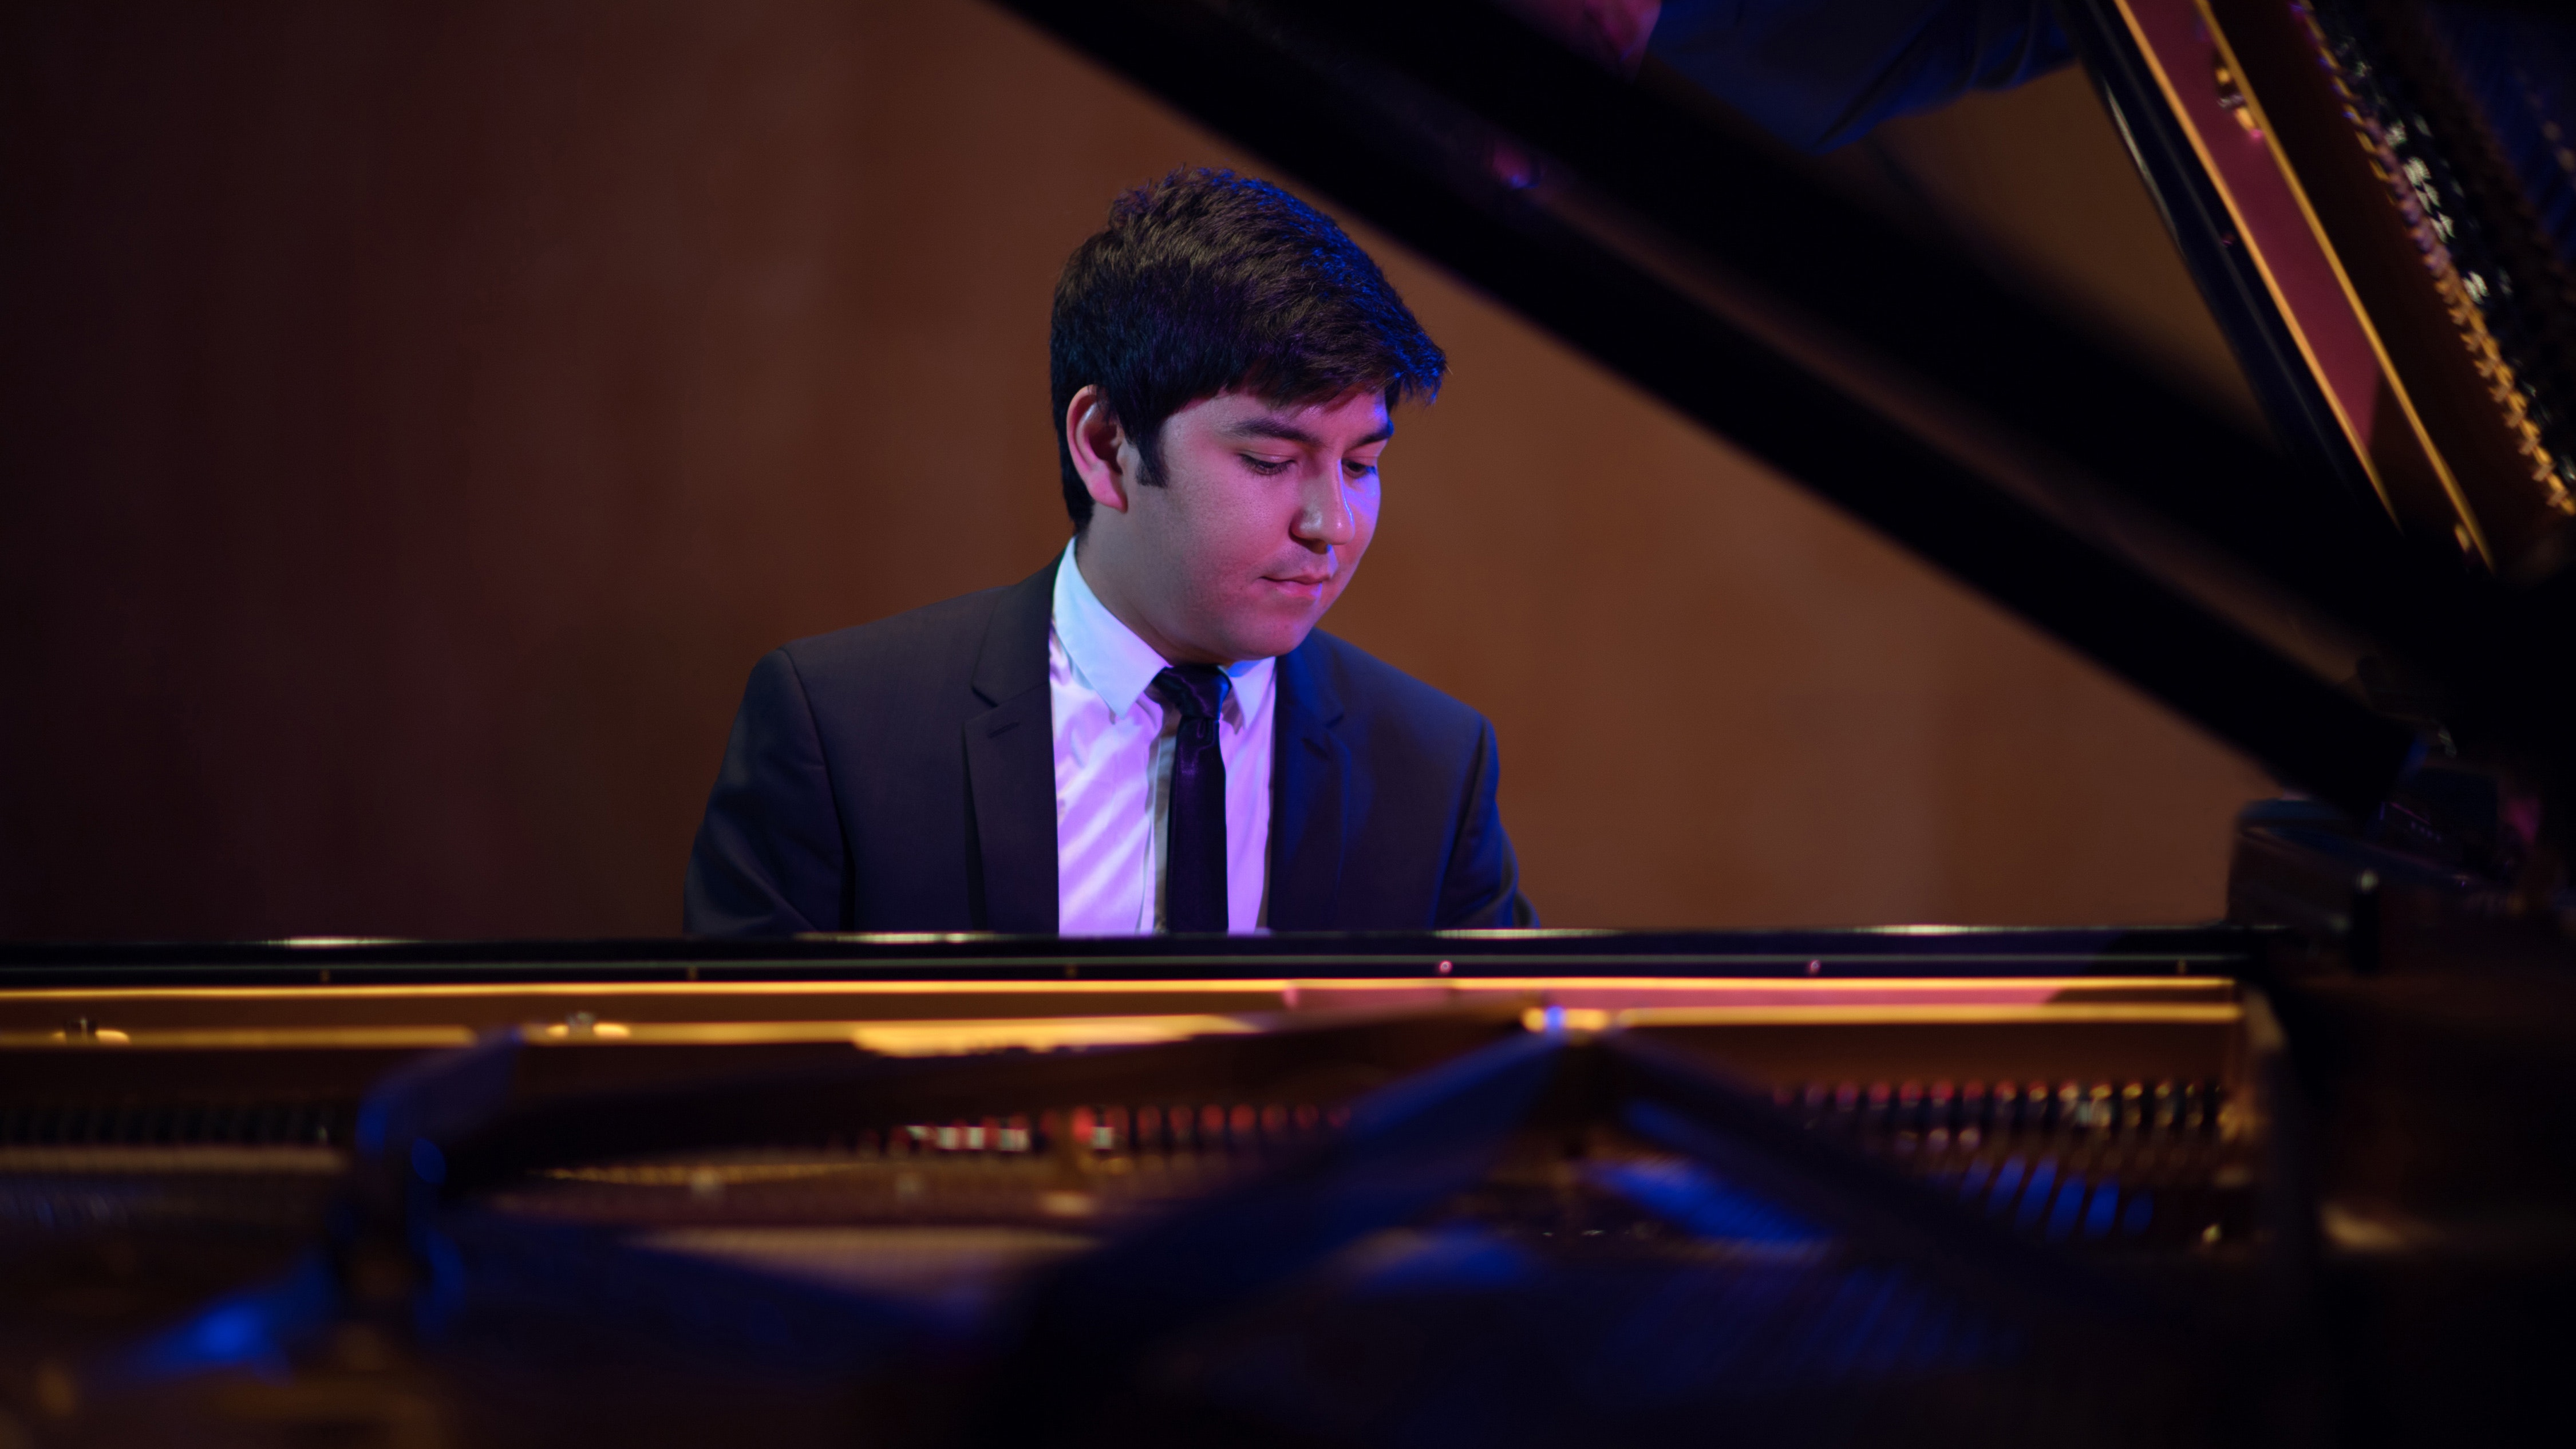 #MPhil125 Valery Gergiev dirige Reger et Prokofiev – Avec Behzod Abduraimov